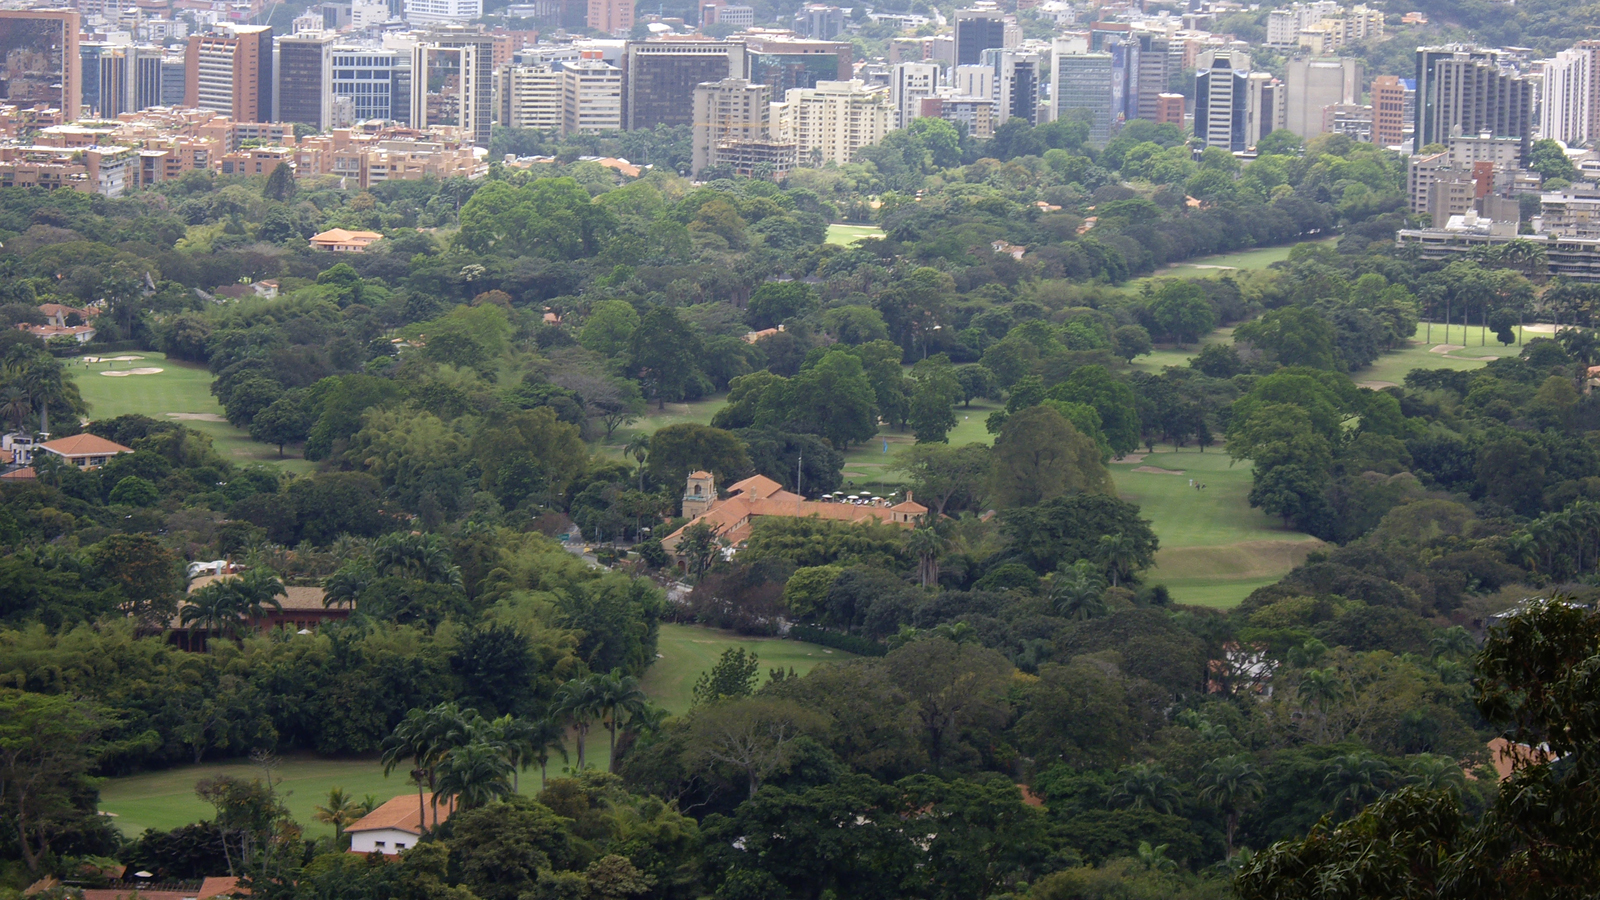 CaracasCountryClub_feature_RaquelScharffenorth_2009_01.jpg